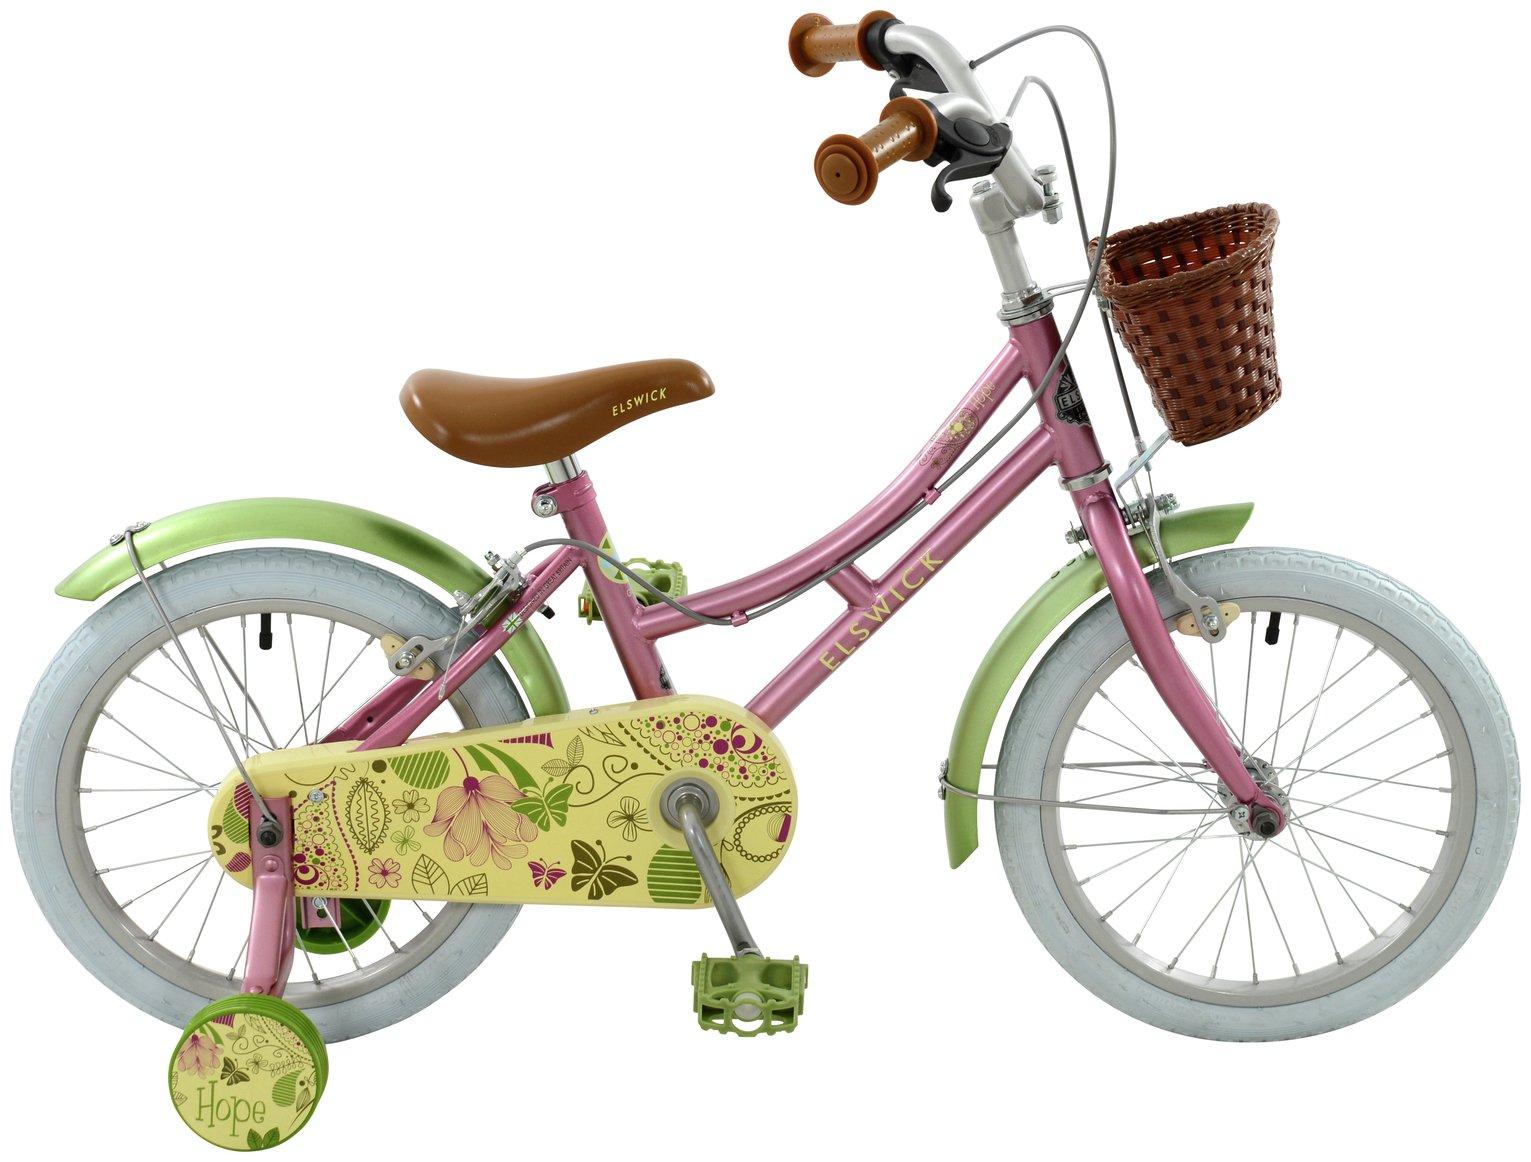 Elswick Hope Kid's 16 Inch Heritage Bike